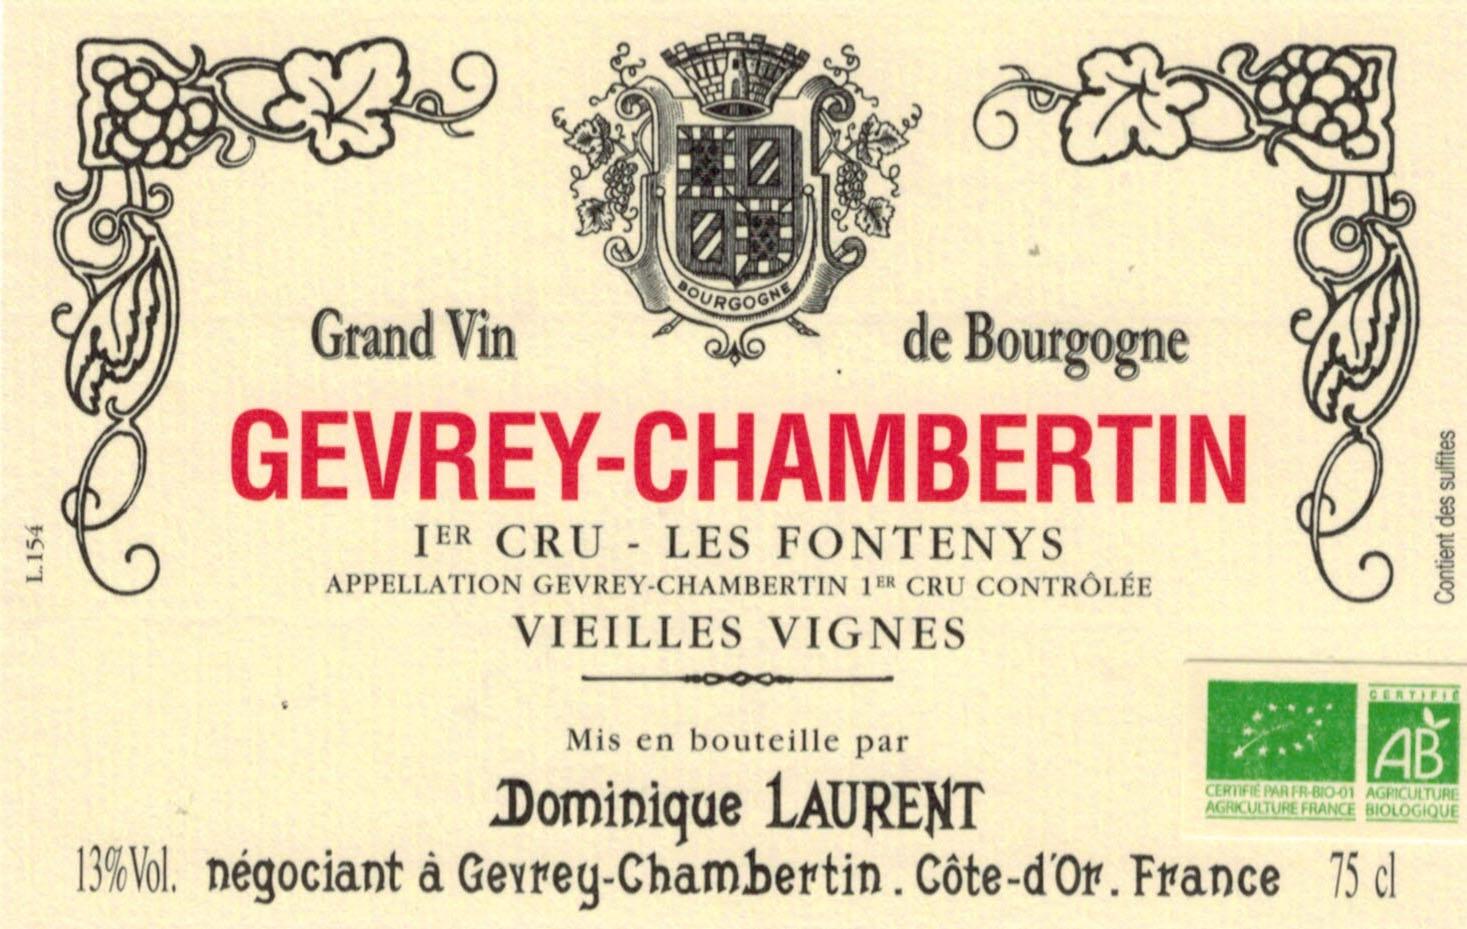 Dominique Laurent Gevrey-Chambertin Fontenys VV pour Lindaboie.jpg